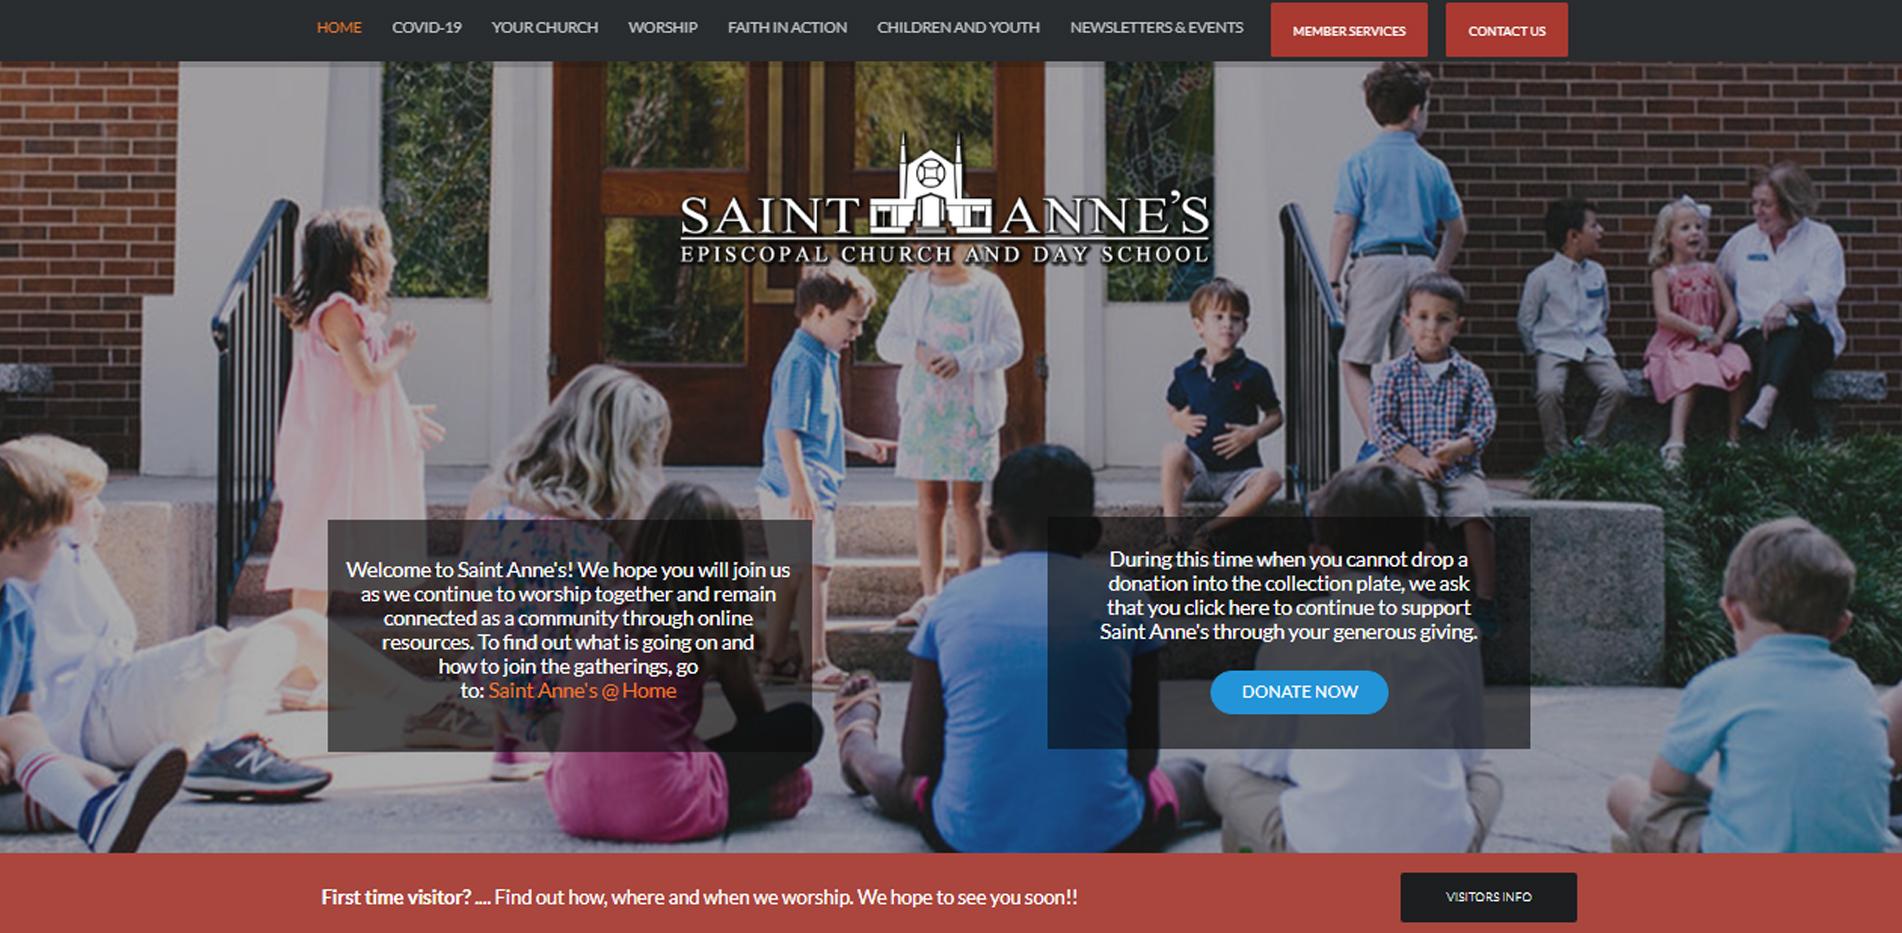 atlanta web design | companies | website design | atlanta web design companies | web designer atl | web